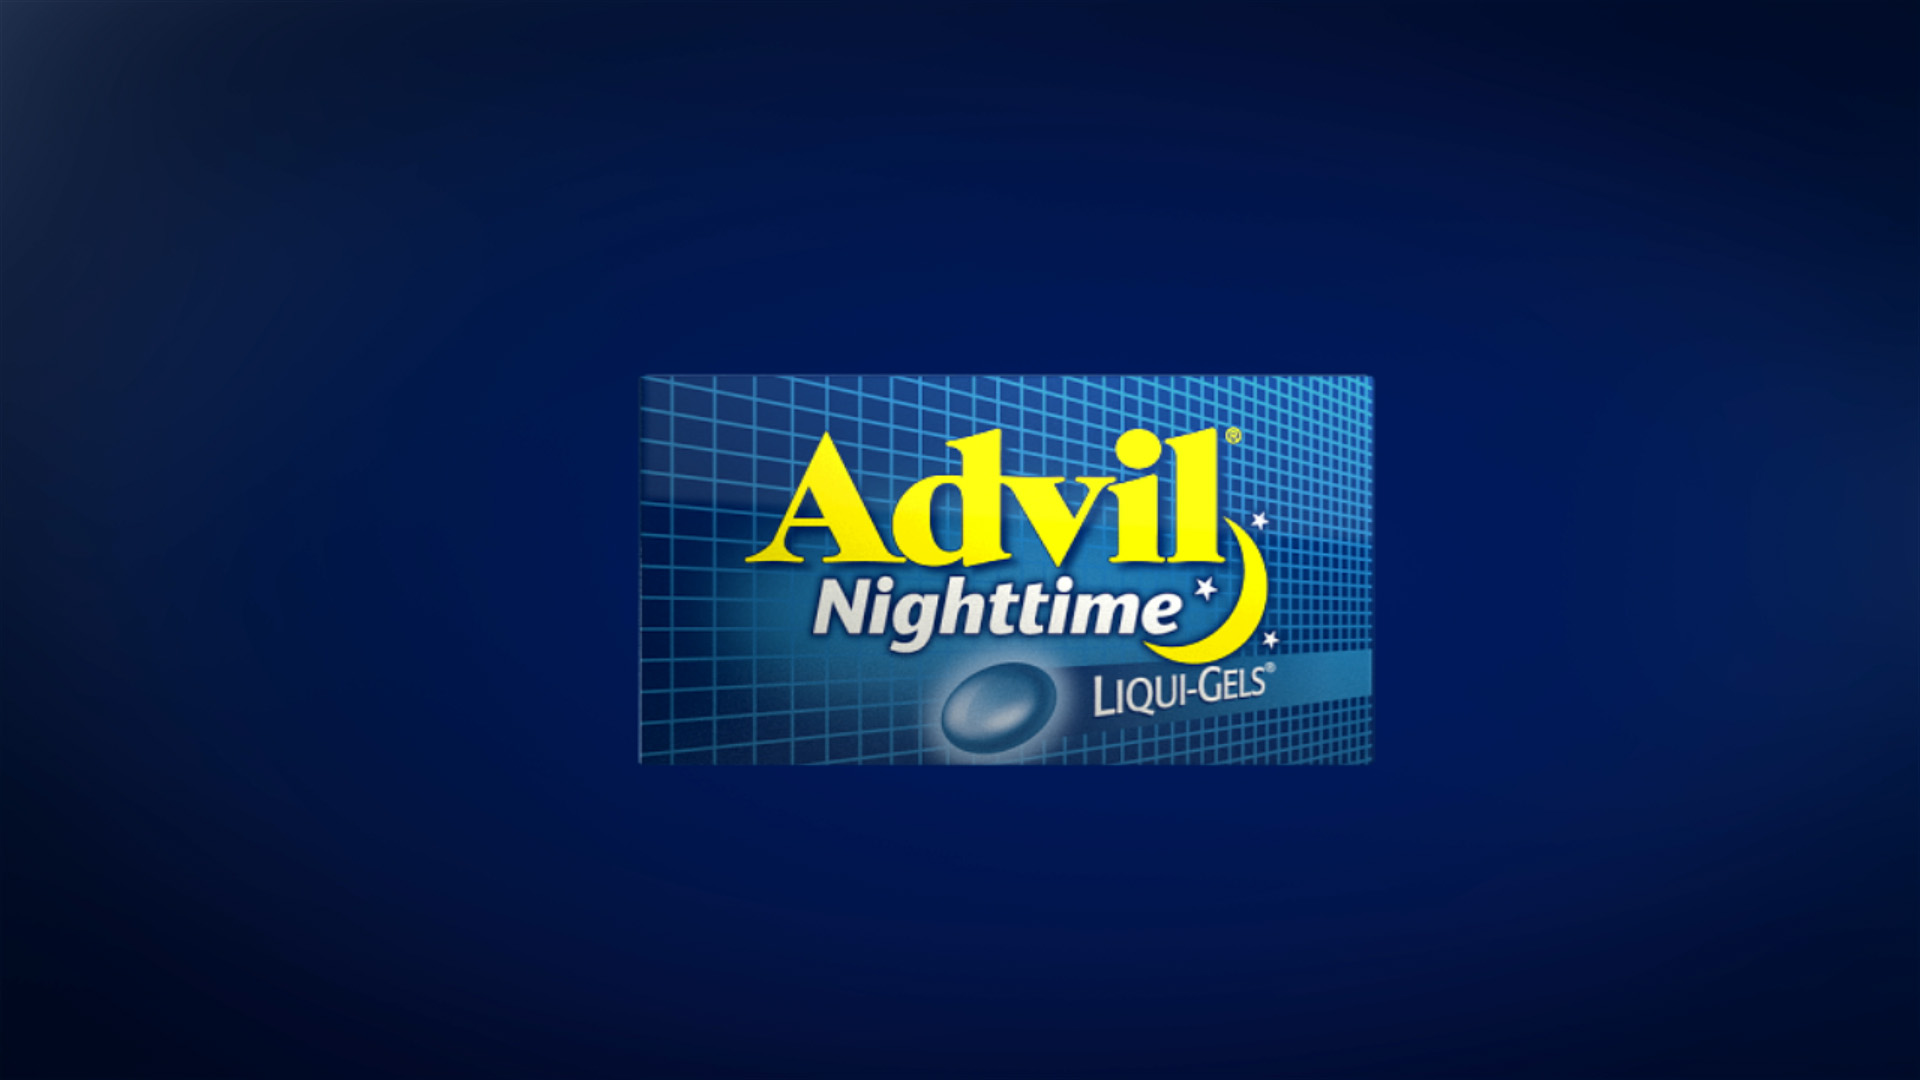 advil_hitchclock_image05